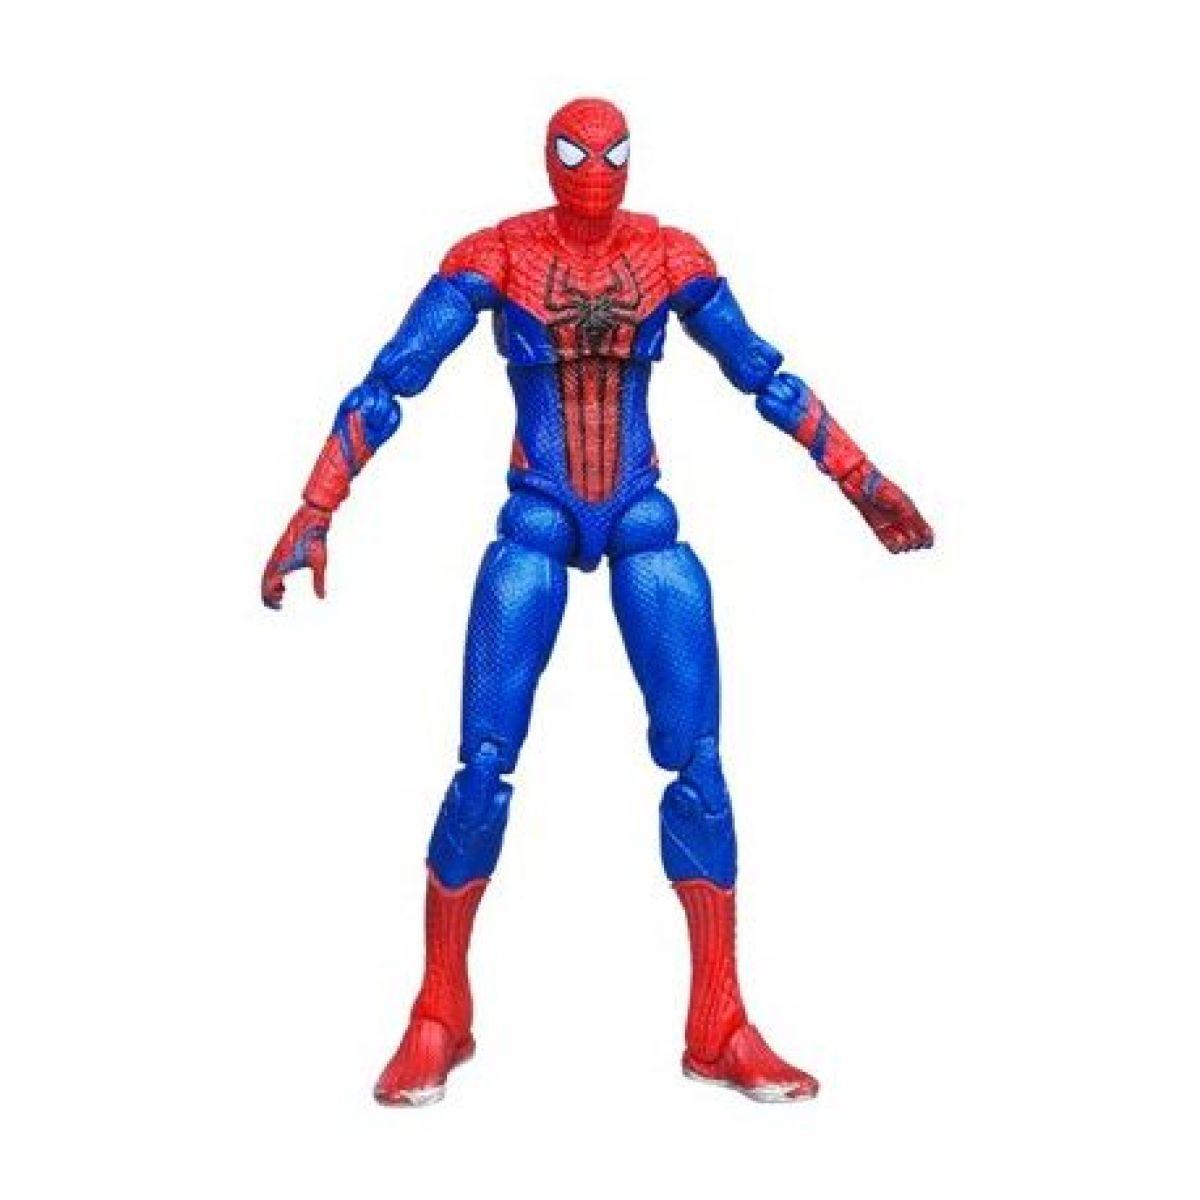 Spiderman akční figurky Hasbro - 38326 Poseable